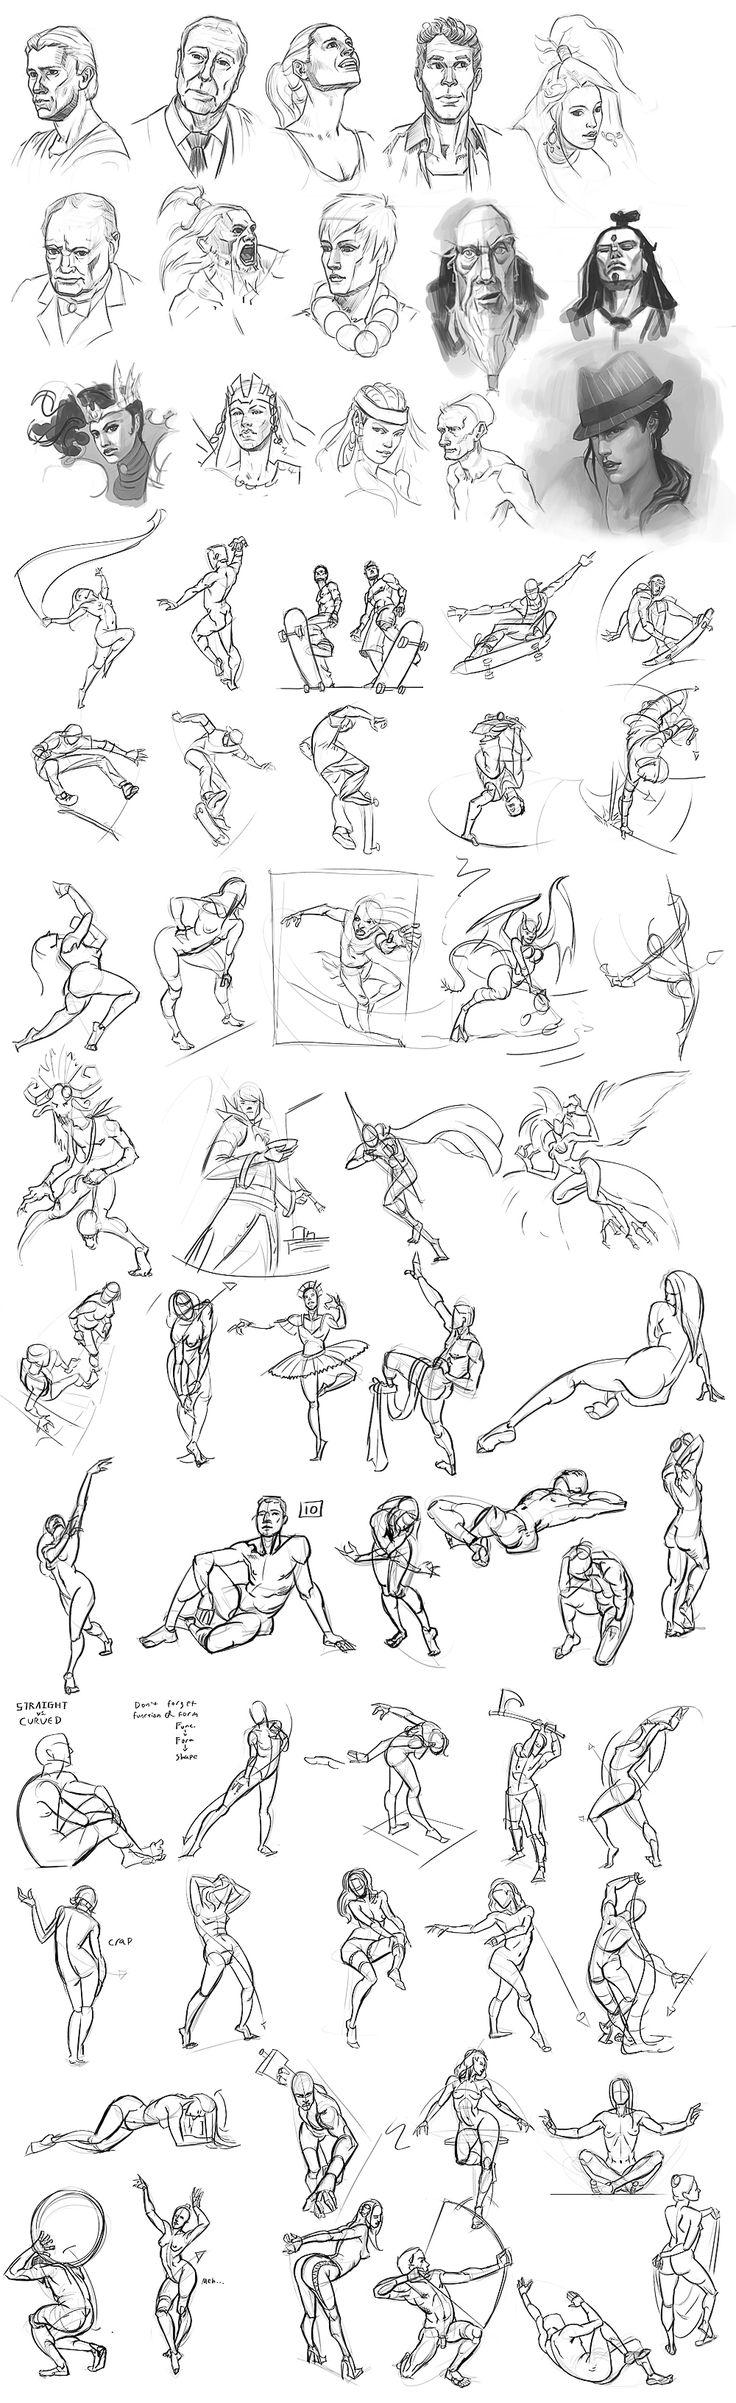 Figure Drawing 014 by Andantonius on deviantART via cgpin.com